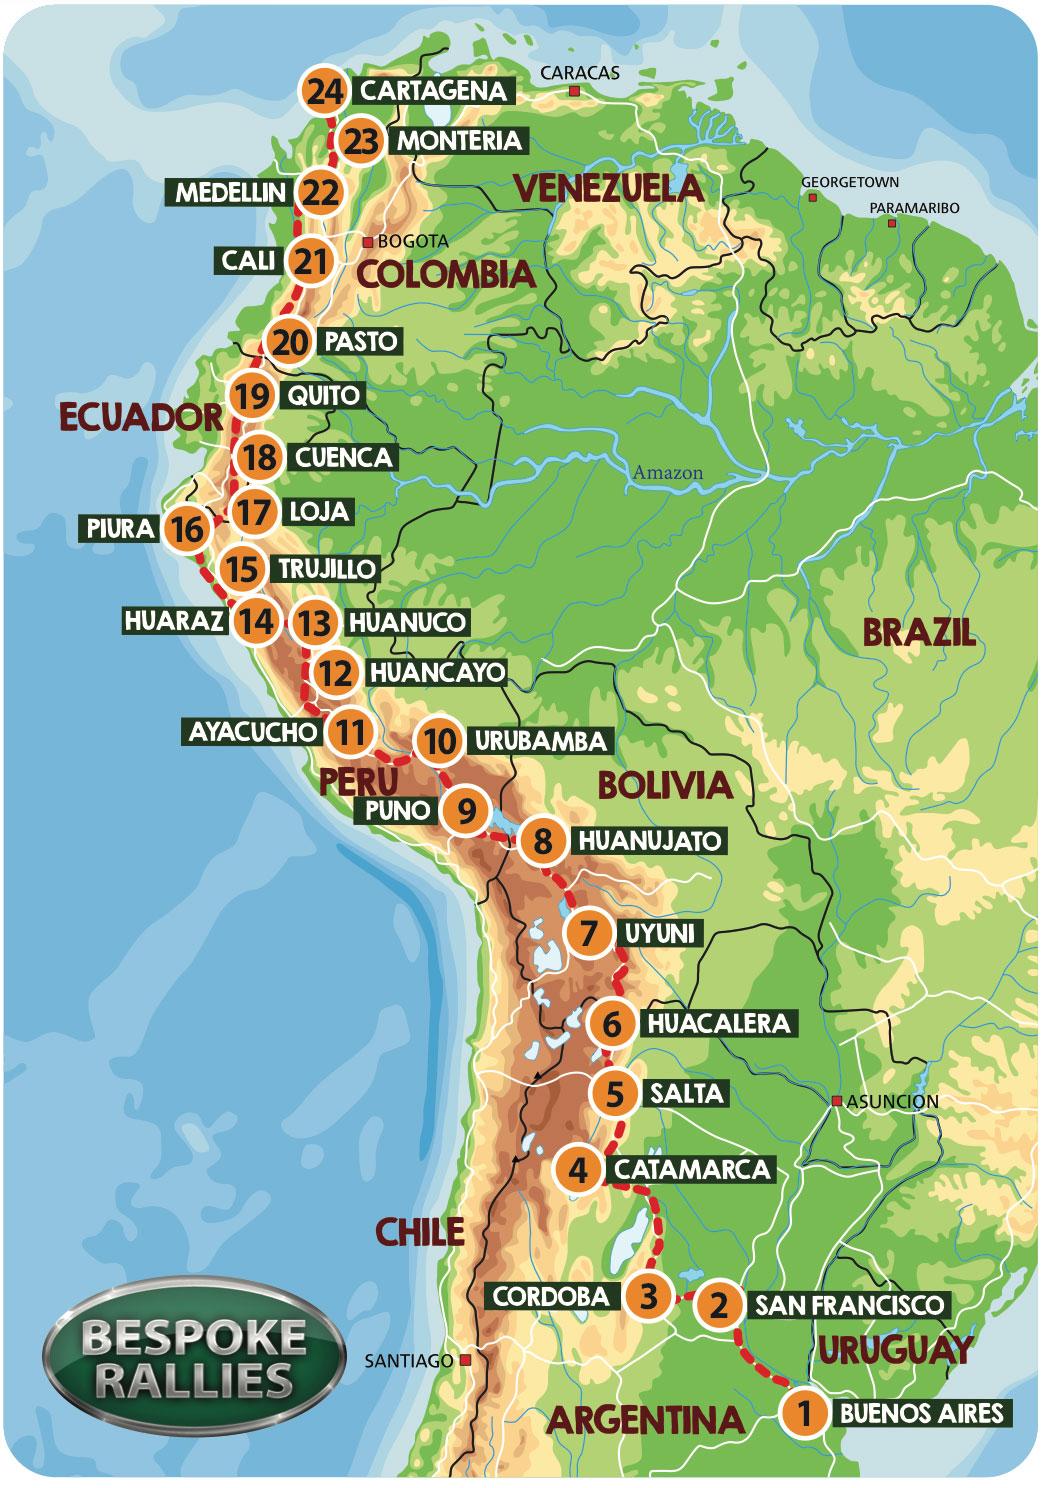 Rally Live: Bespoke Rallies   Grand Prix of South America   Classic Car Rally